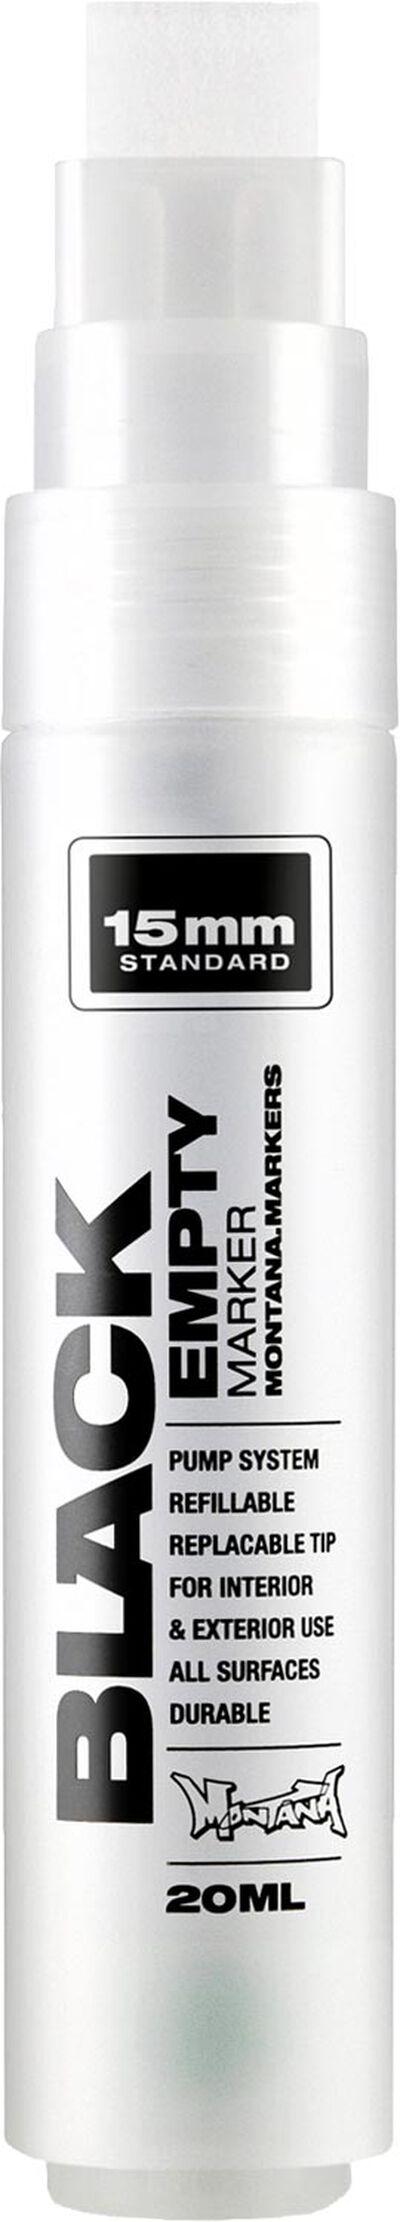 Black 15 mm Standard